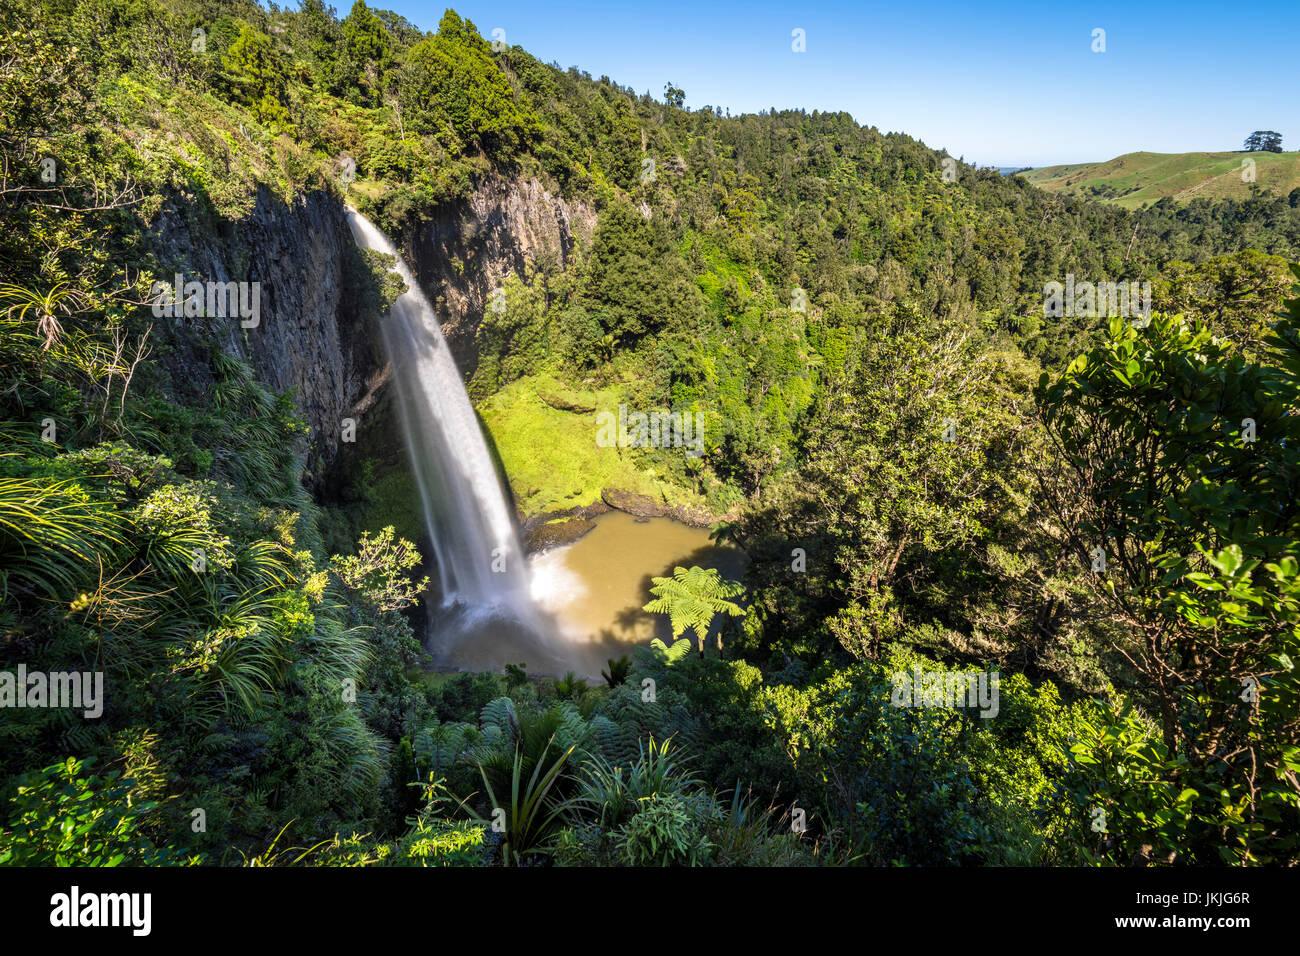 Nouvelle Zélande, île du nord, Raglan, Bridal Veil Falls Photo Stock